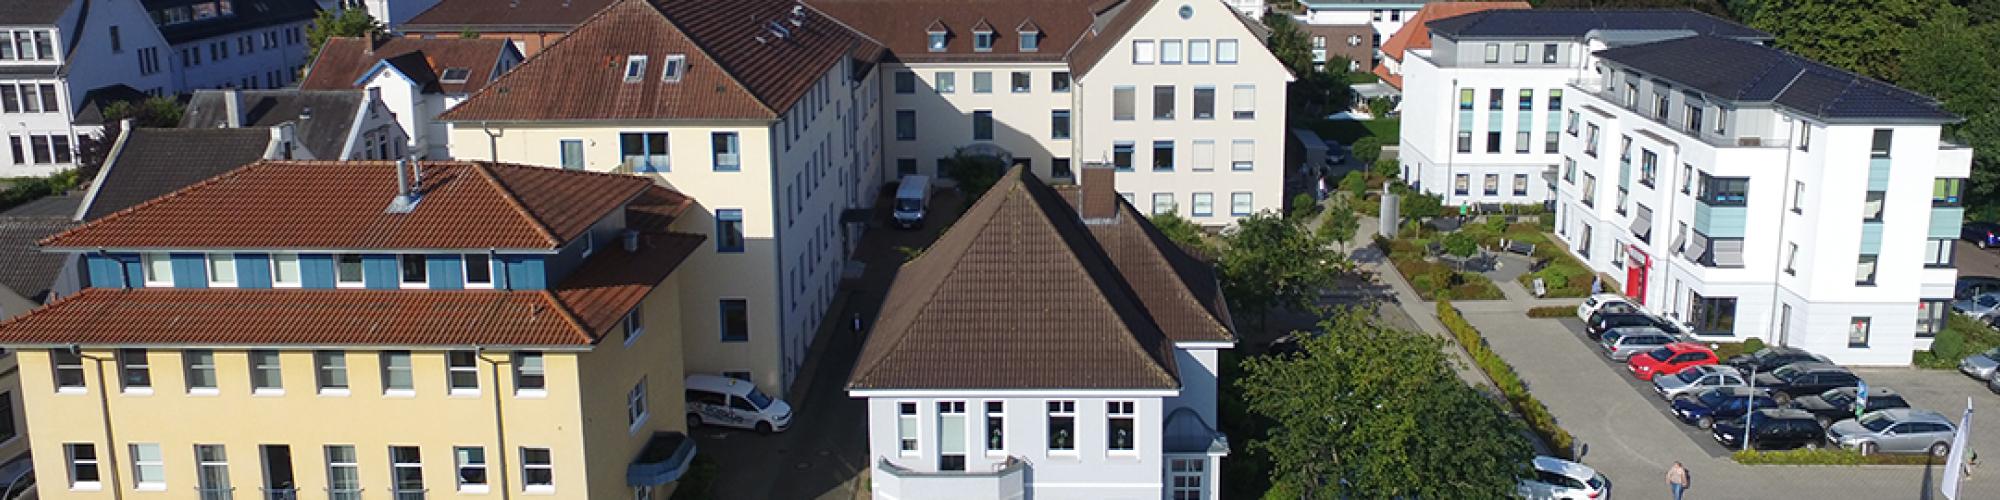 St. Bernhard-Hospital gGmbH